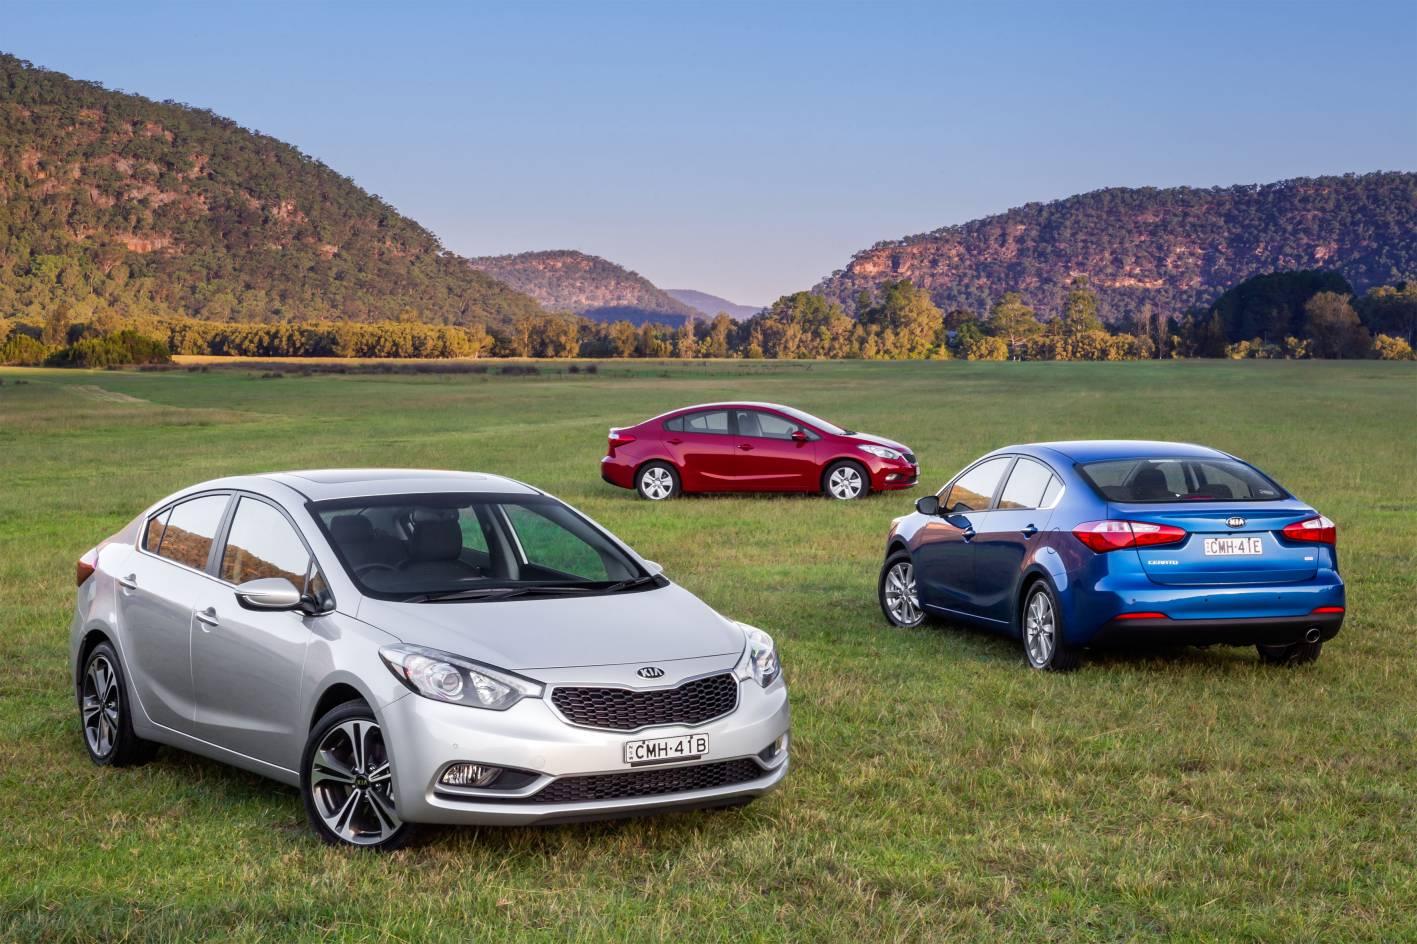 Kia Cars - News: Cerato Sedan on sale now from $19,990